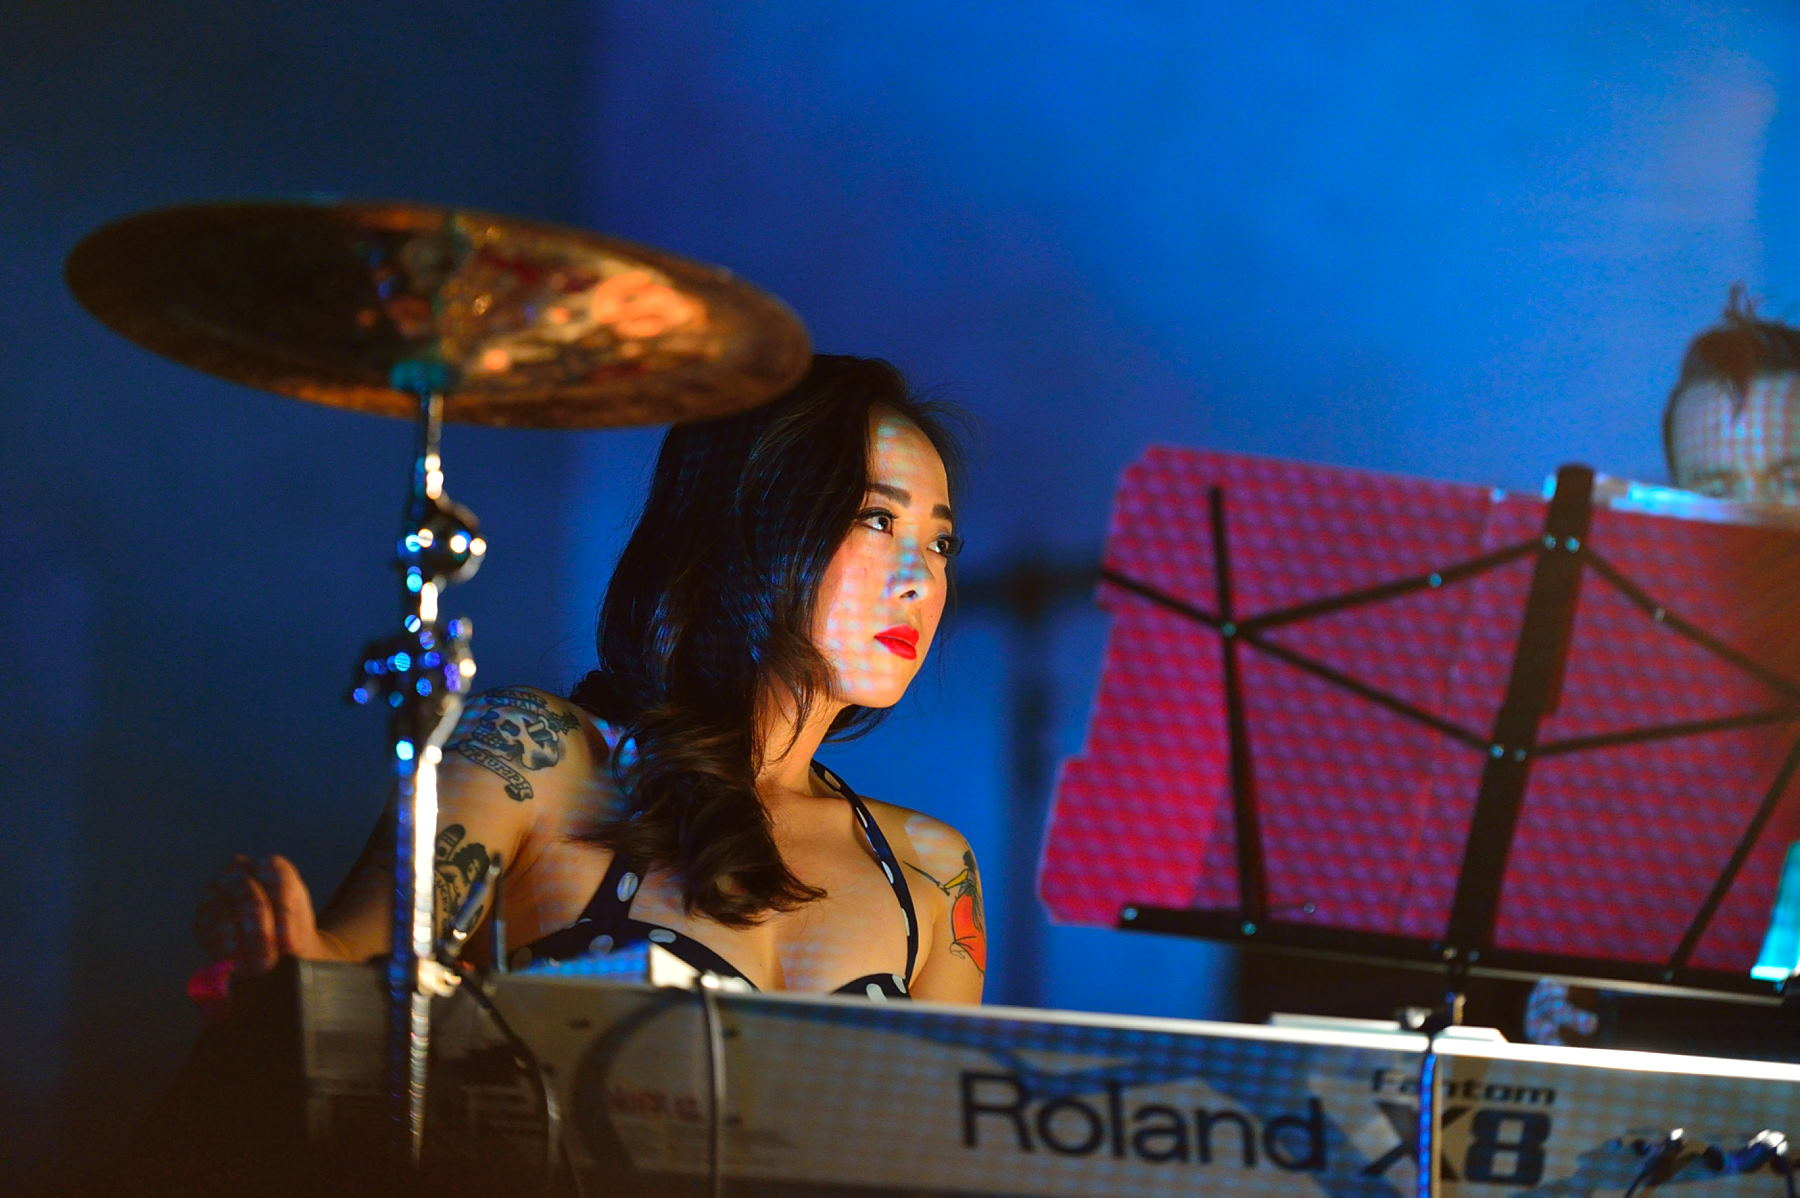 xiu xiu4 Live Review: Xiu Xiu plays the Music of Twin Peaks at Londons Saint John at Hackney (10/8)